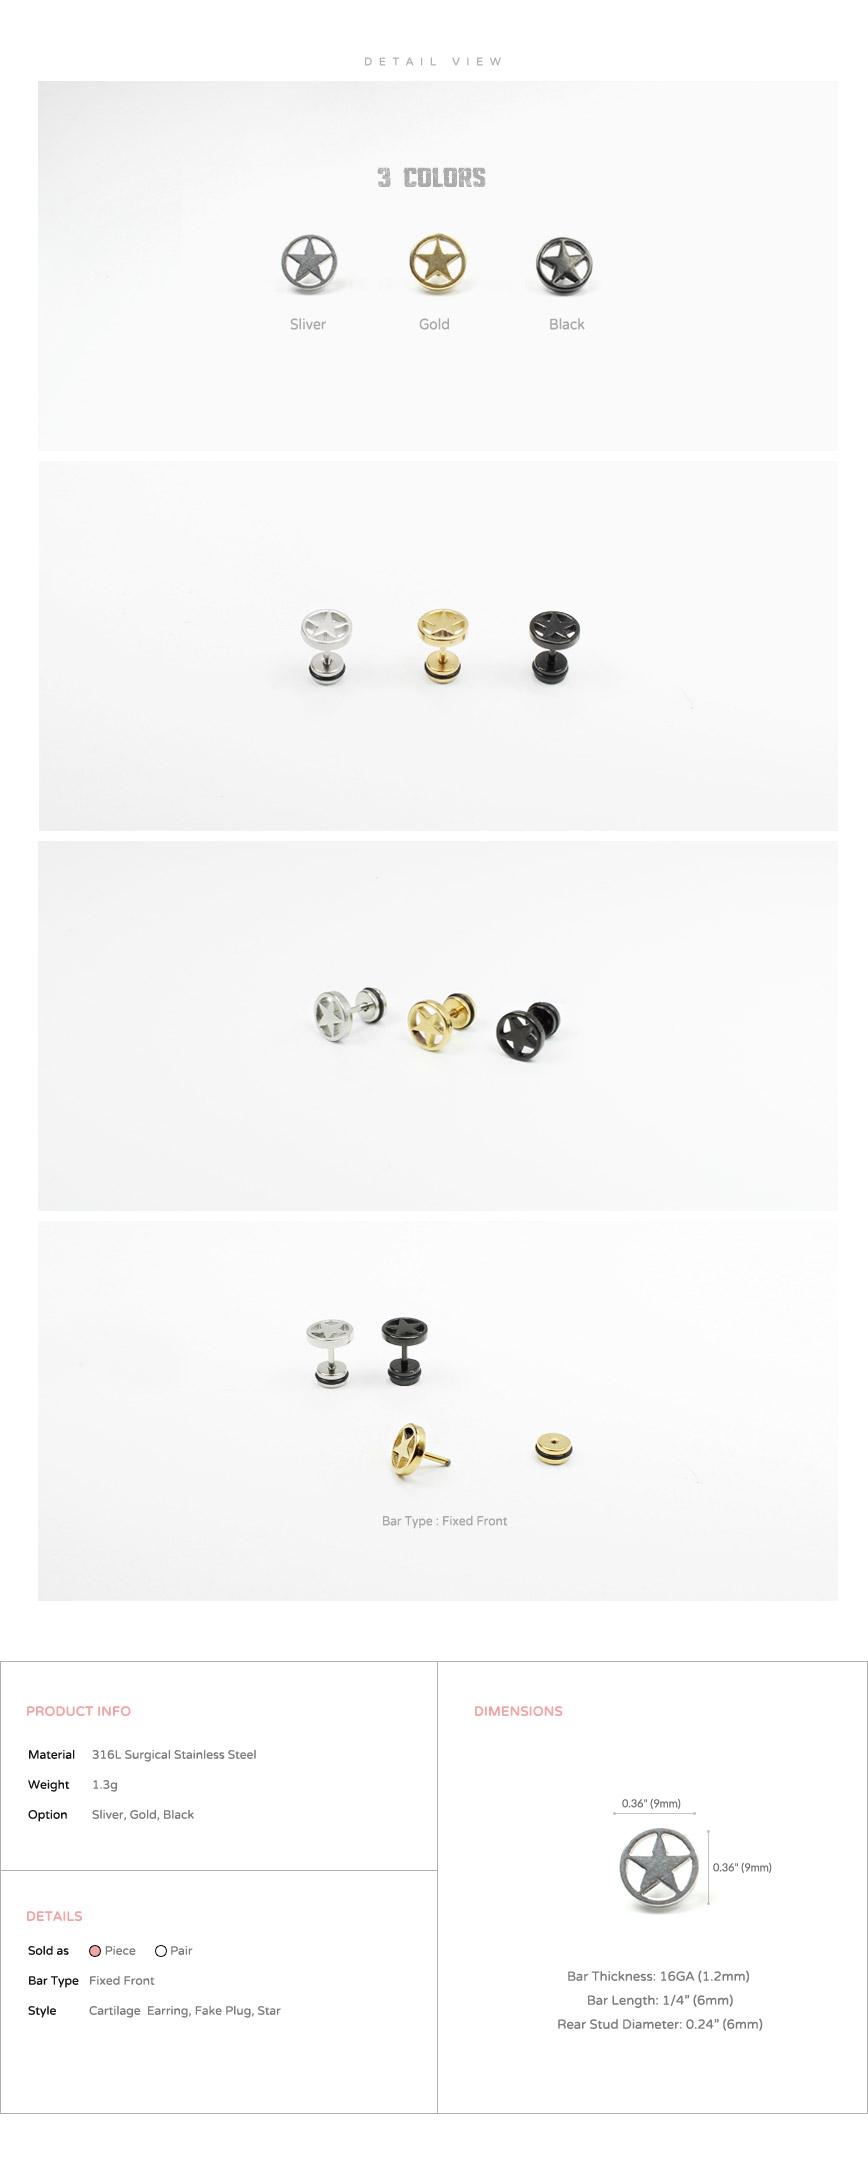 accessories_Korean-style_asian-style_316l_ear_cartilage_piercing_earrings_16g_ear-studs_cheater_fake_plug_star_5